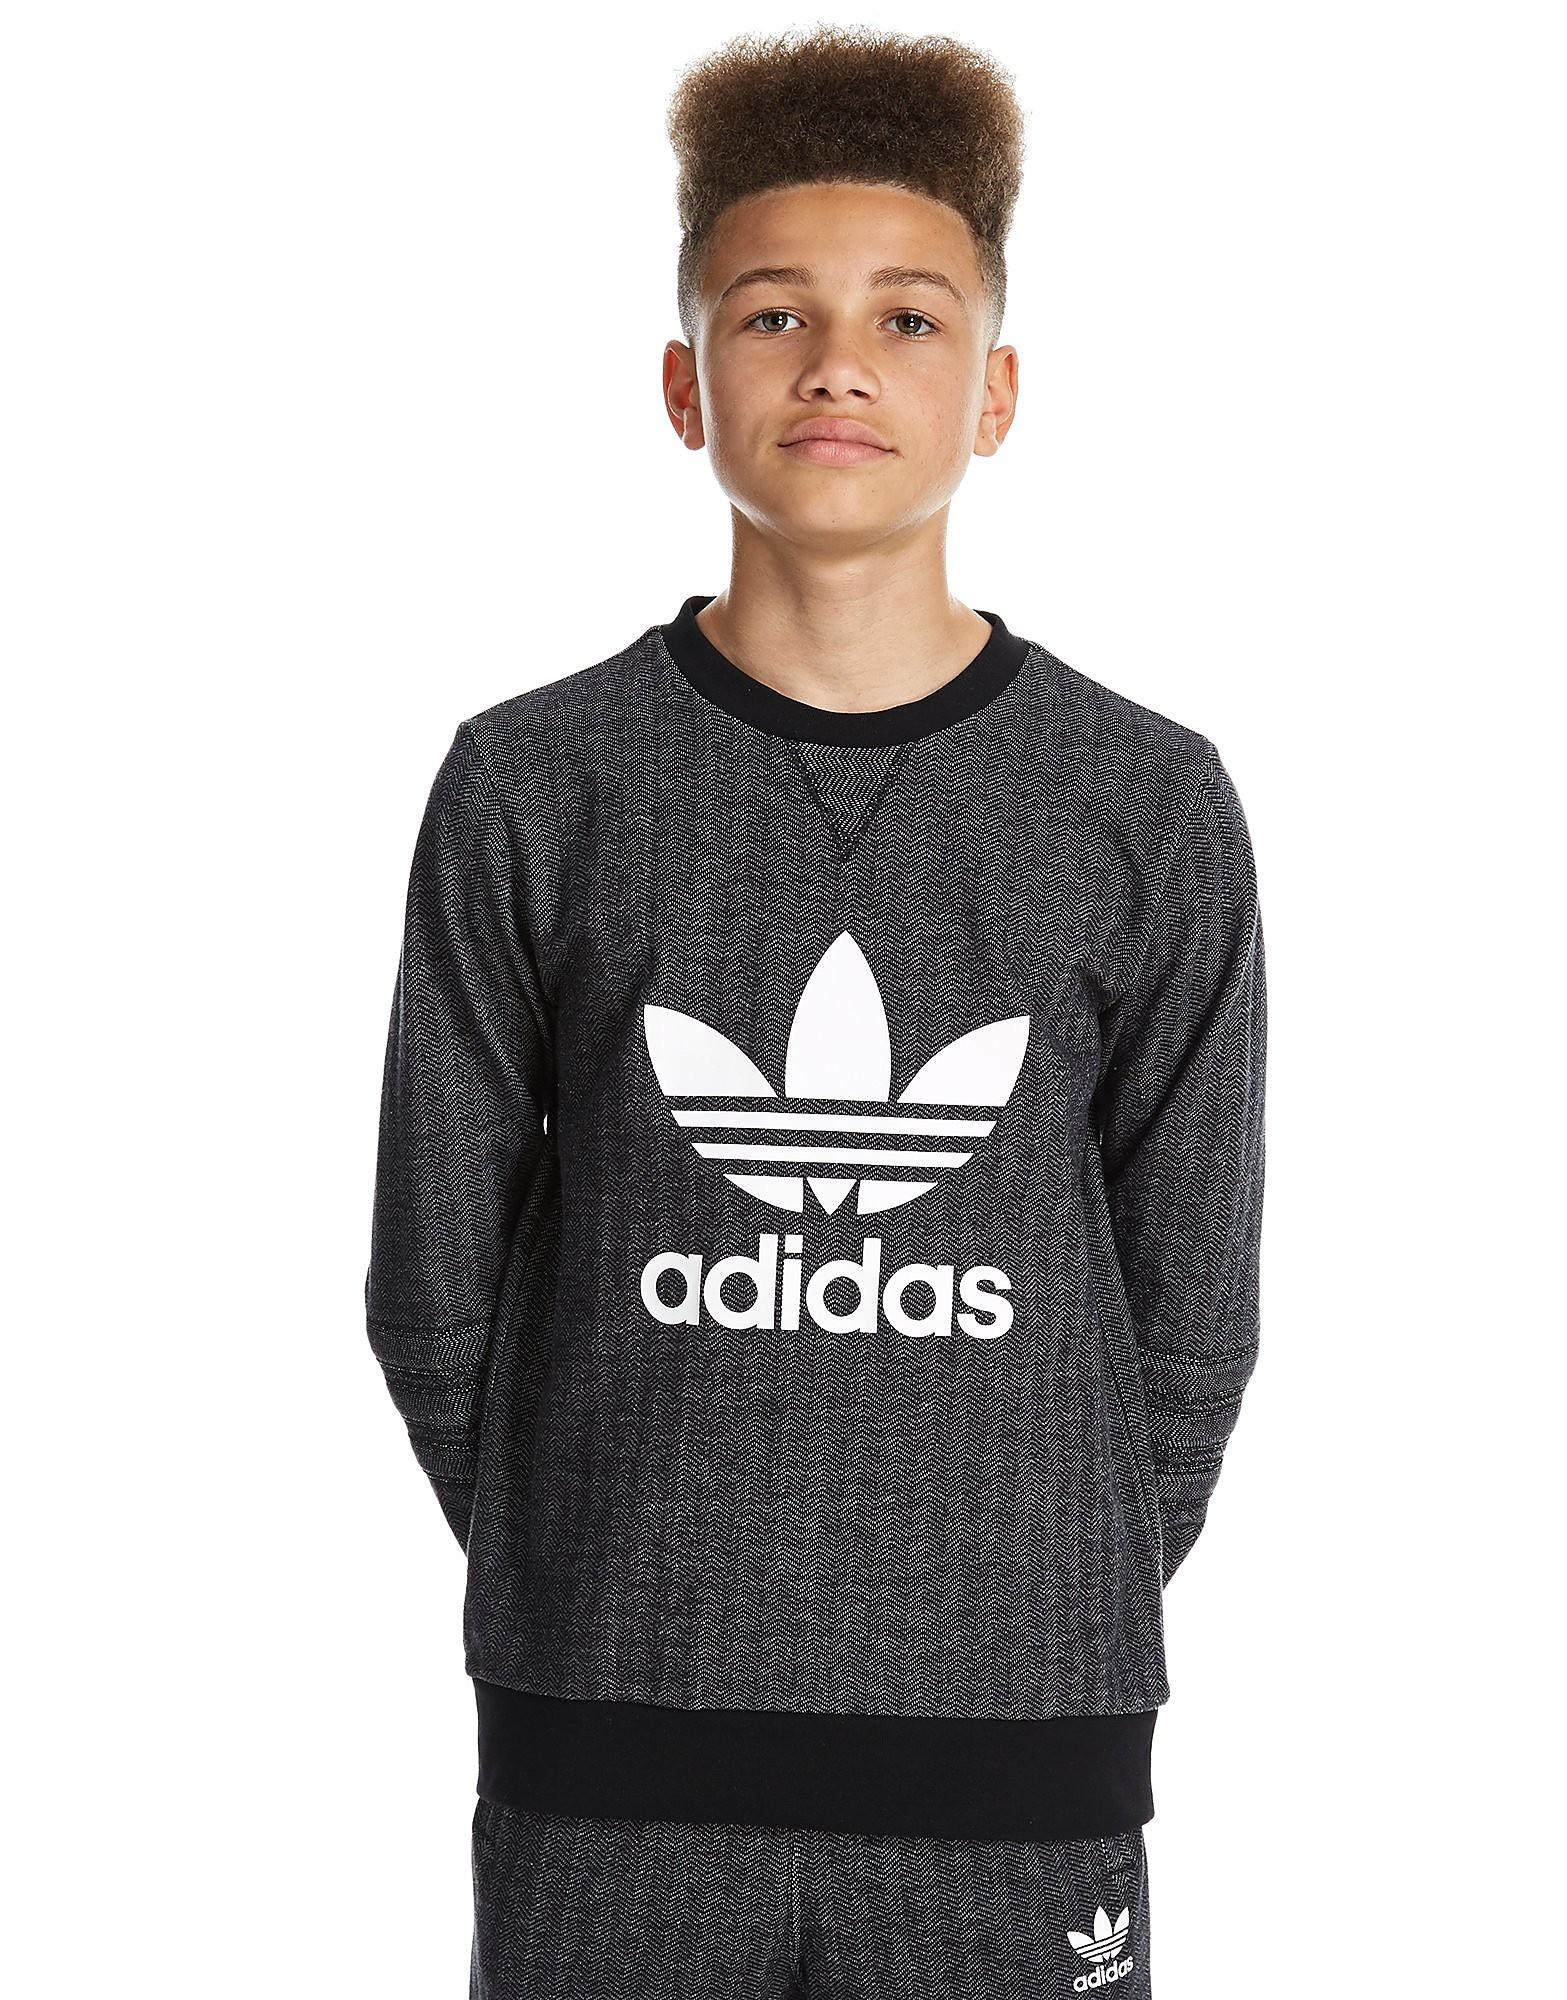 adidas Originals Trefoil Sweatshirt Junior